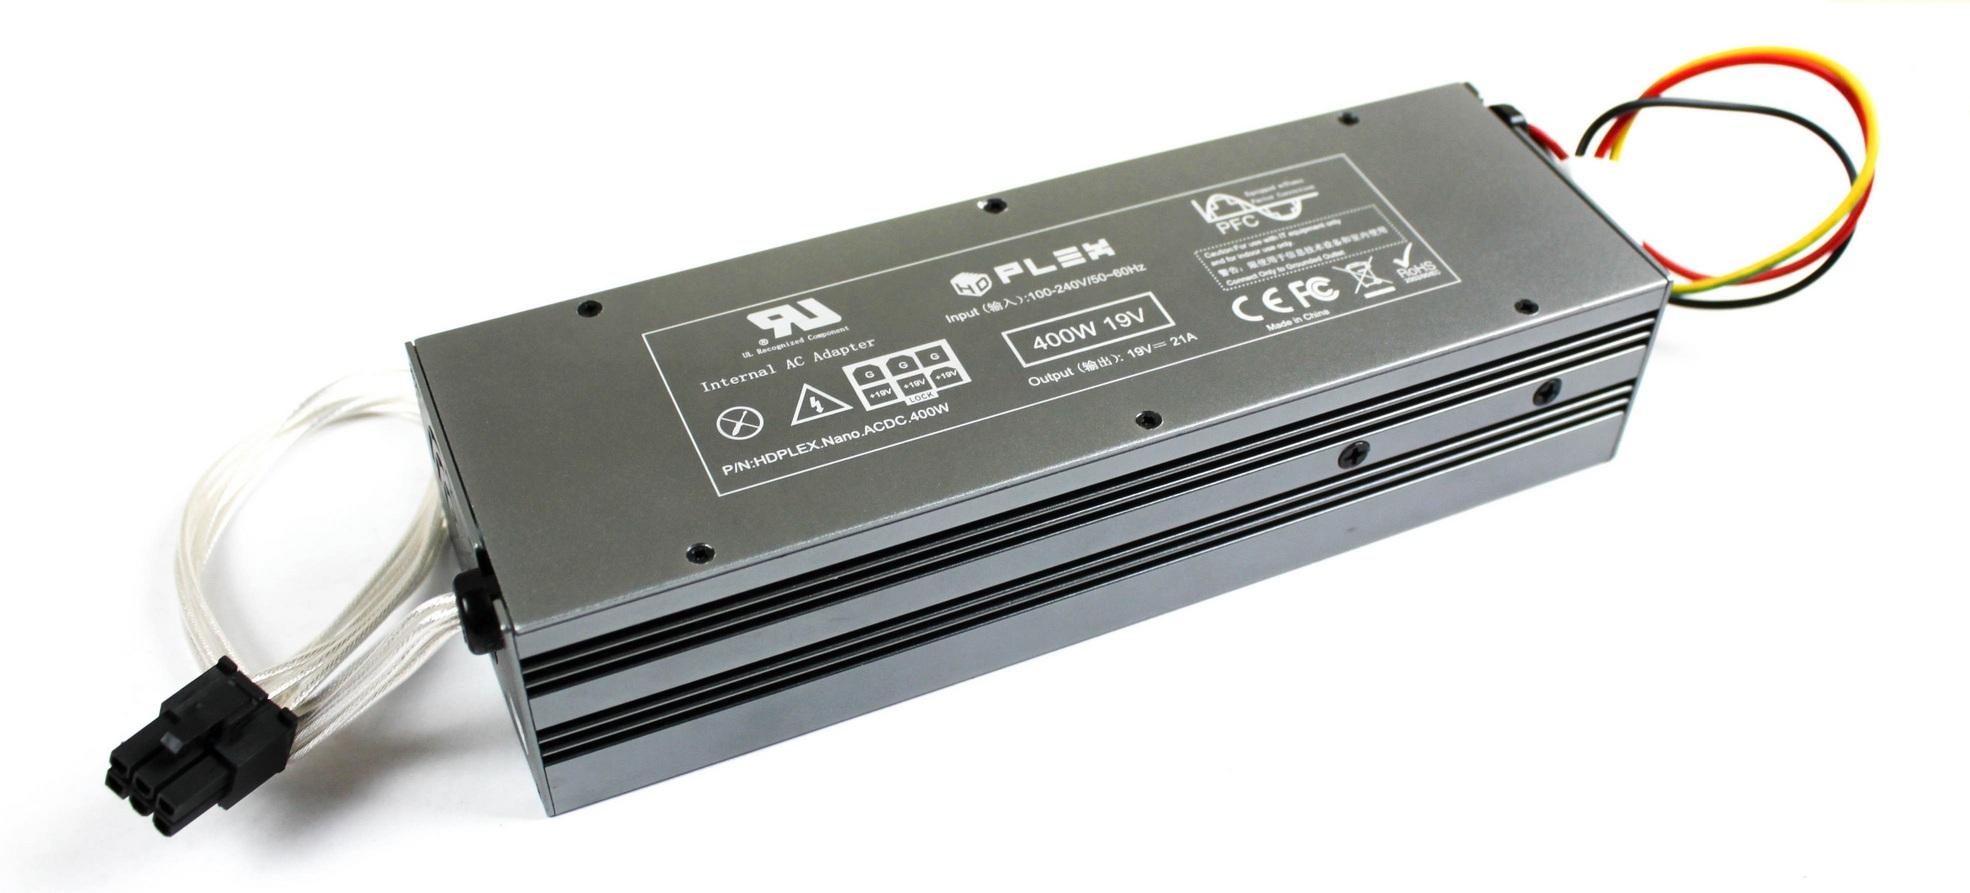 HDPLEX 400W AC-DC Adapter